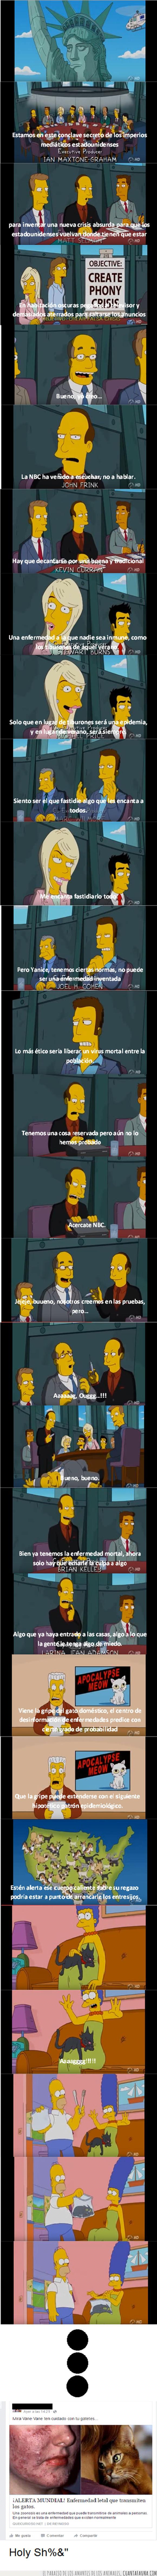 corporativos,futuro,gatos,predecir,Simpson